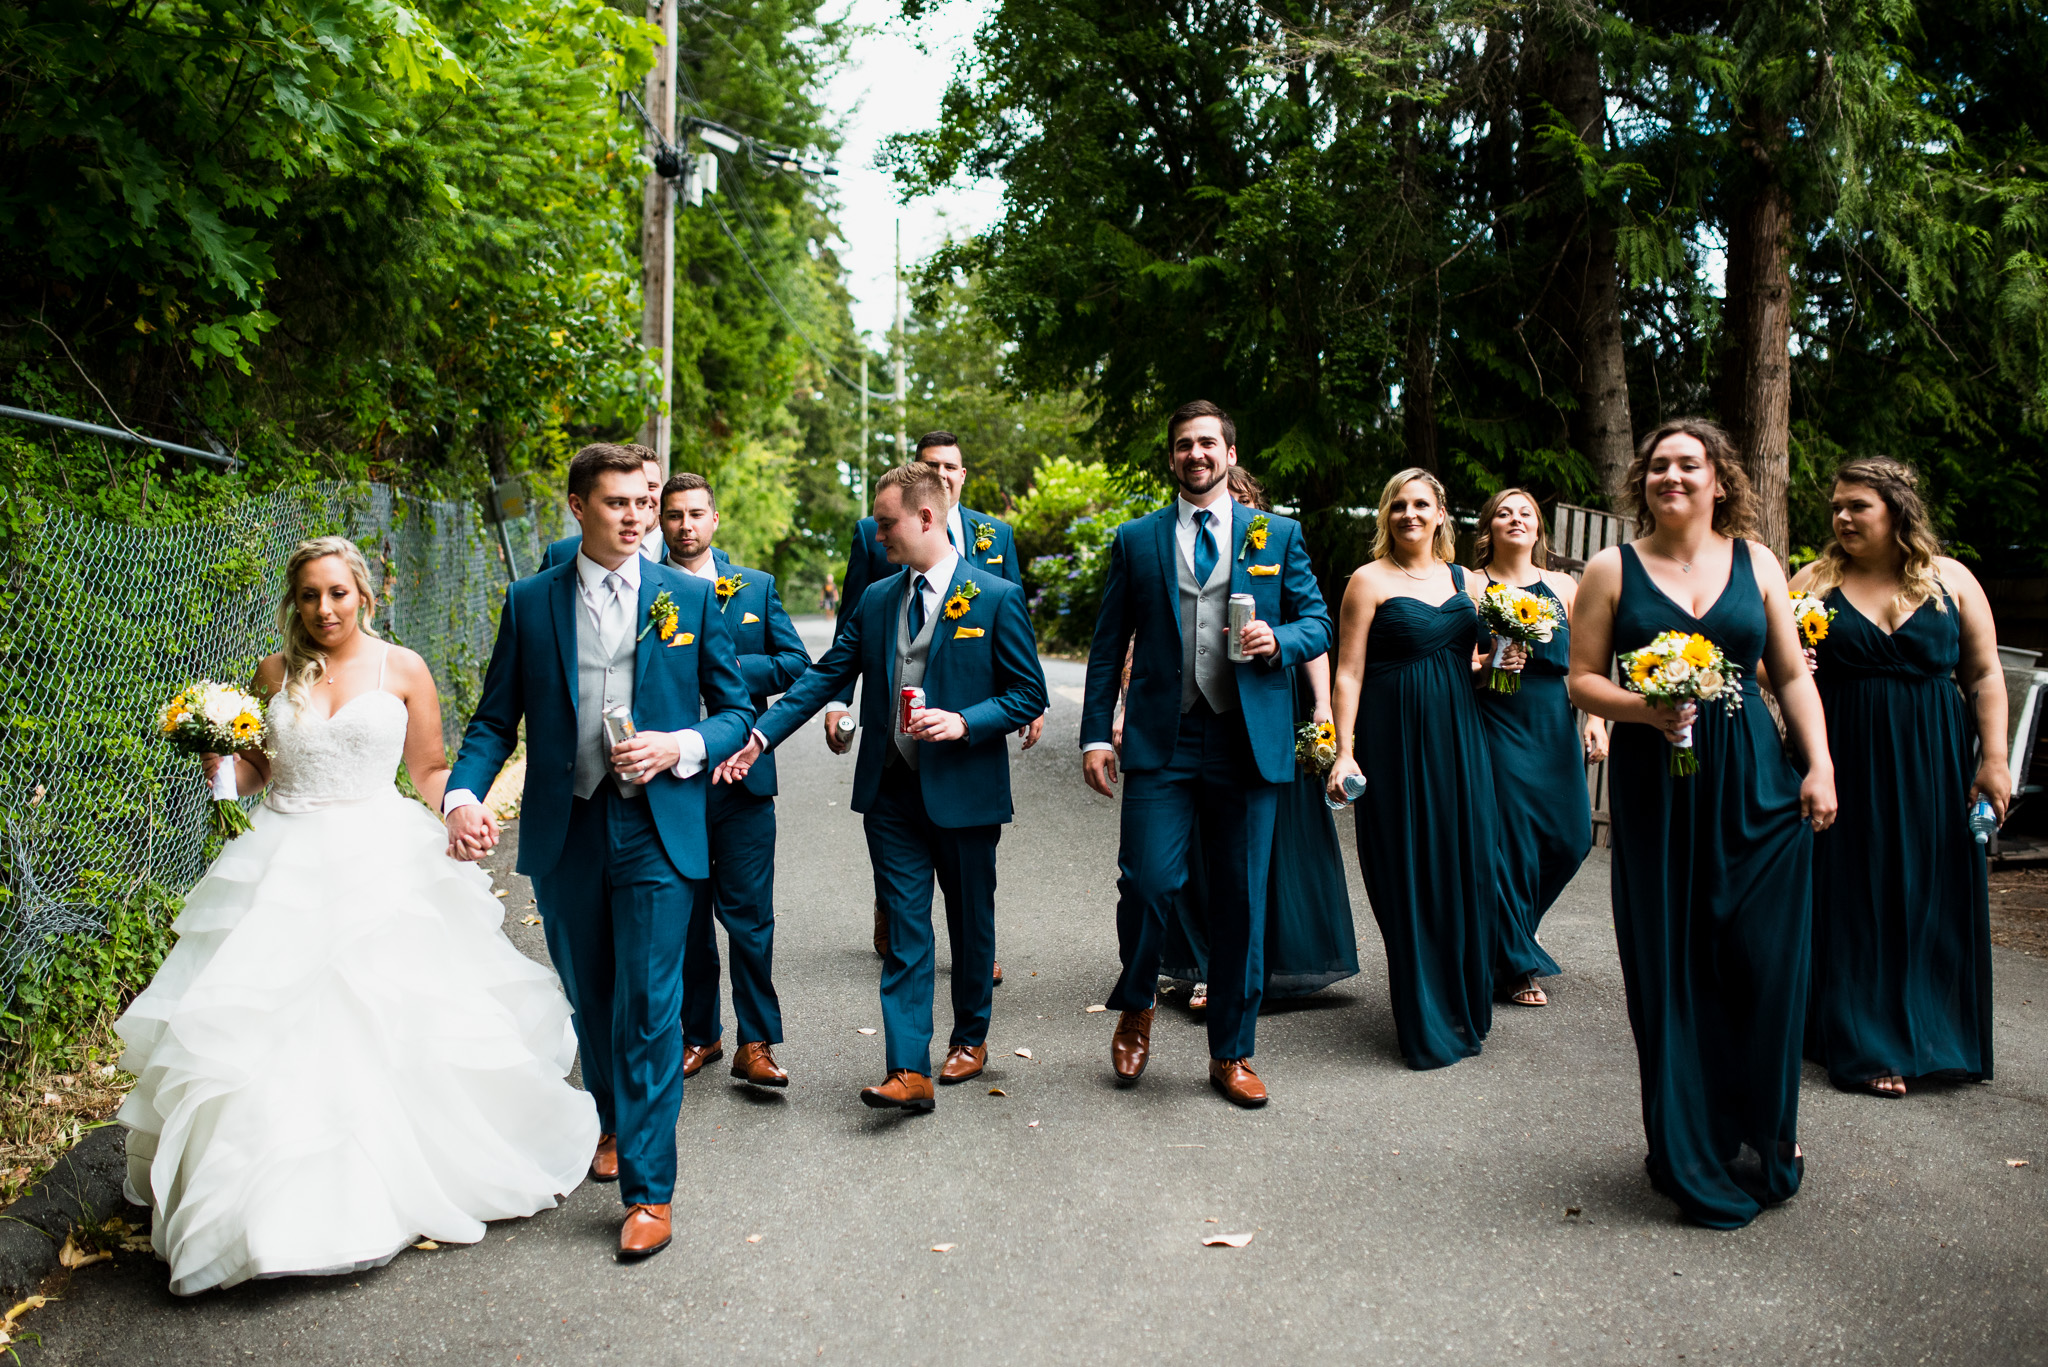 victoria-wedding-photographers-prospect-community-hall-wedding-34.jpg